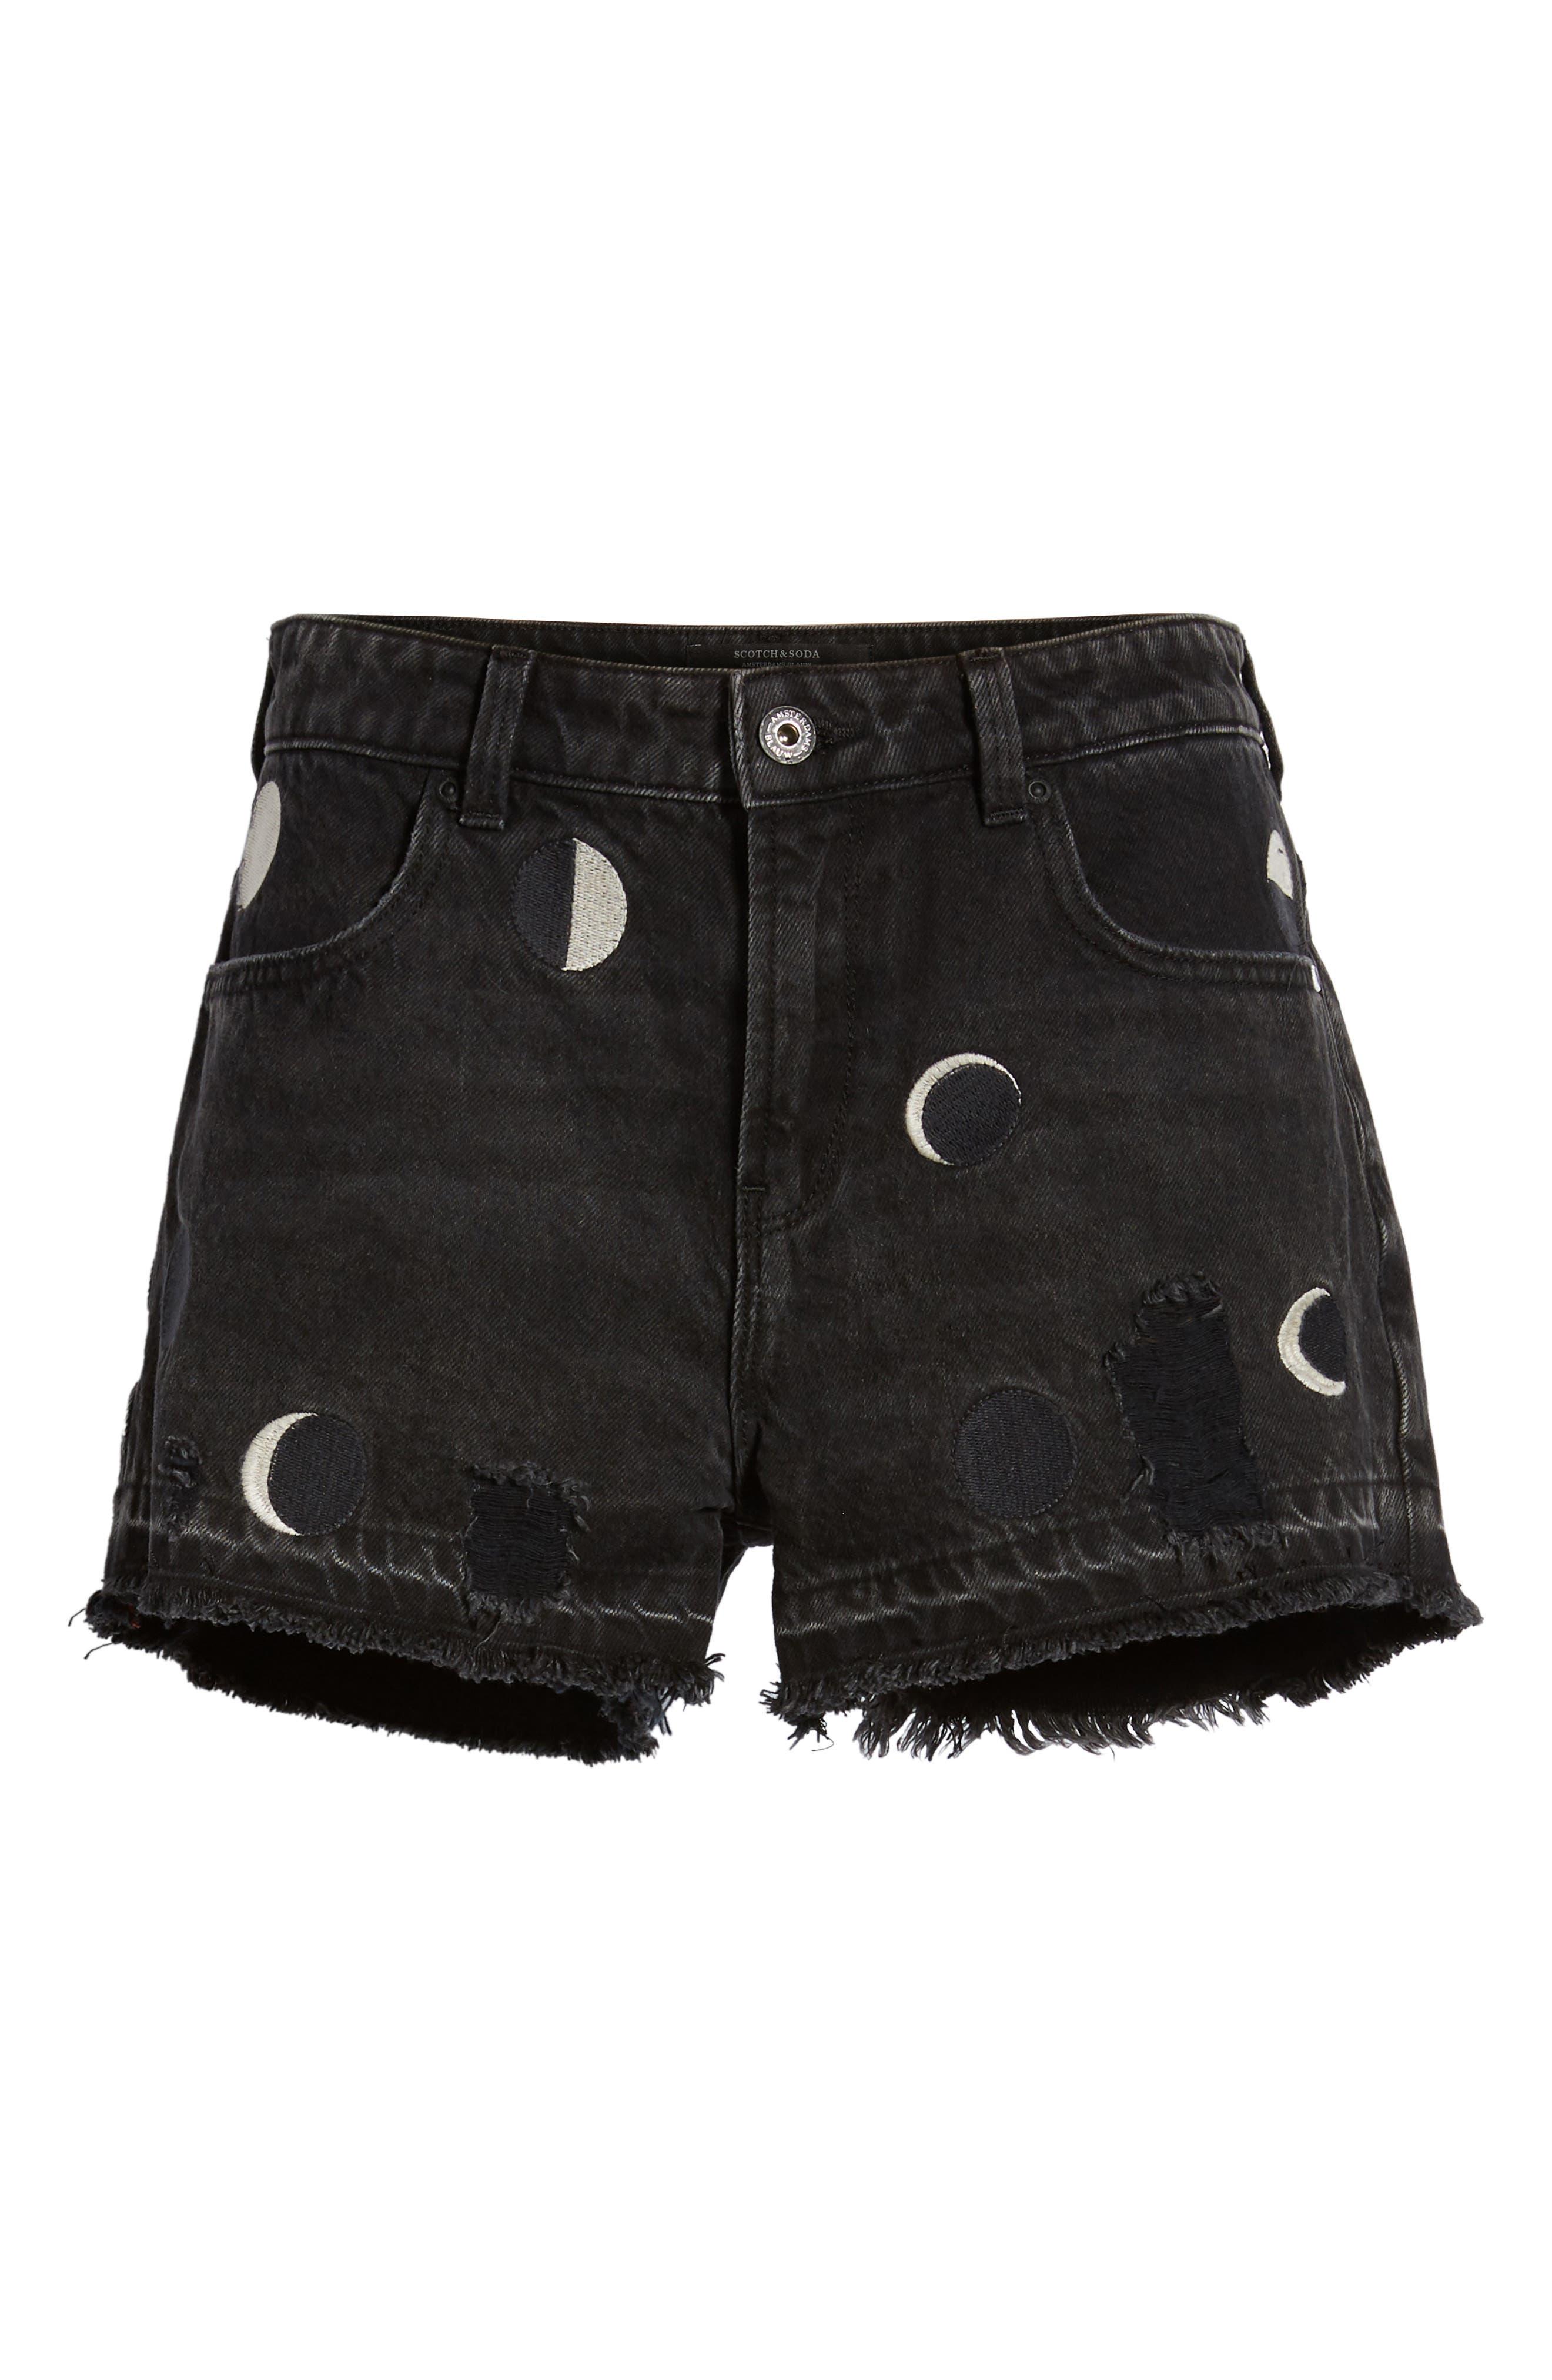 Seasonal Festival Embroidered Denim Shorts,                             Alternate thumbnail 6, color,                             2241 Long Night Moon